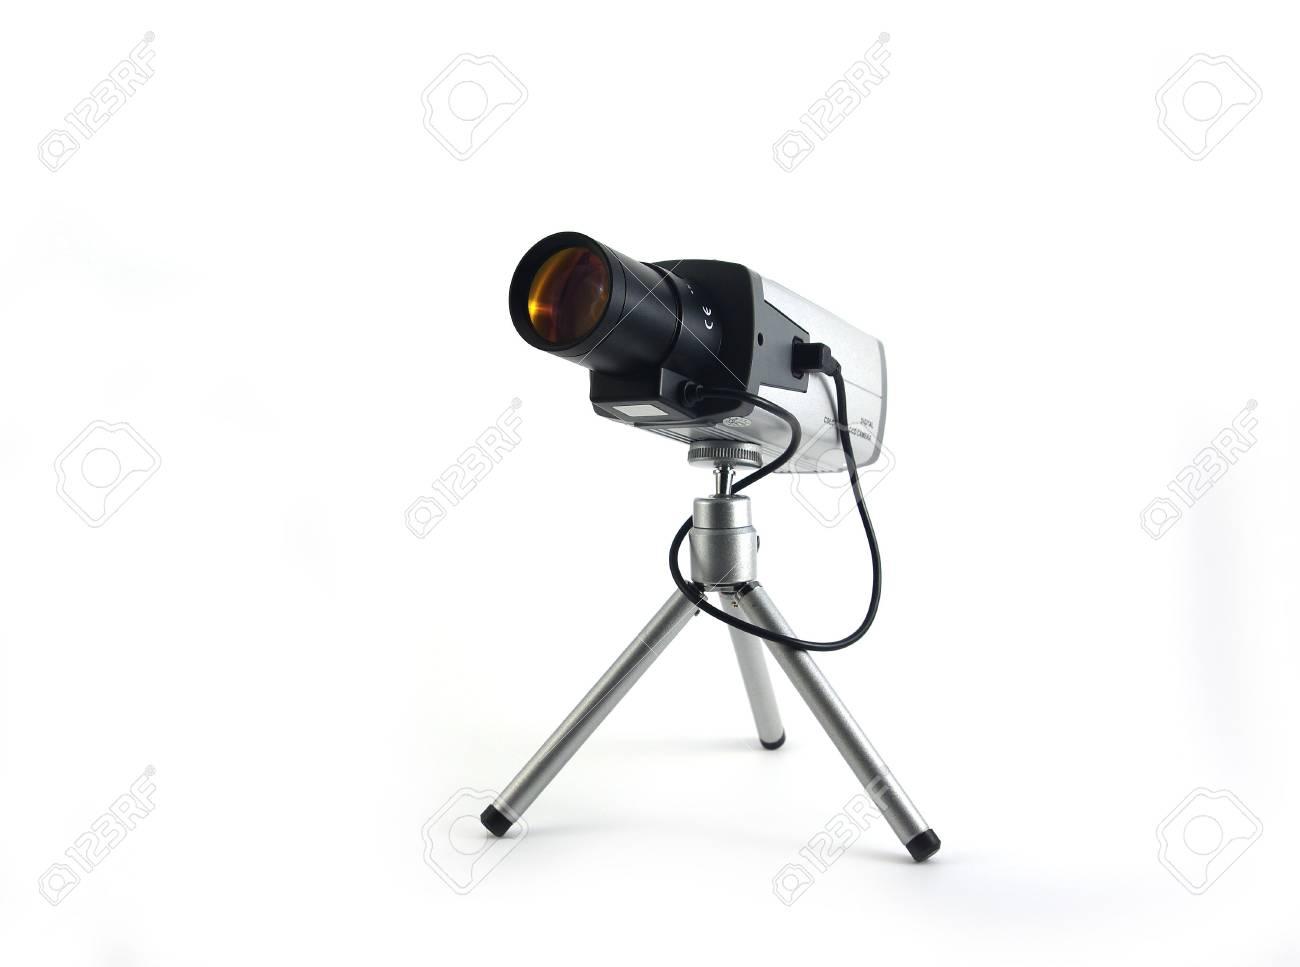 Security camera isolated on white background Stock Photo - 3873017